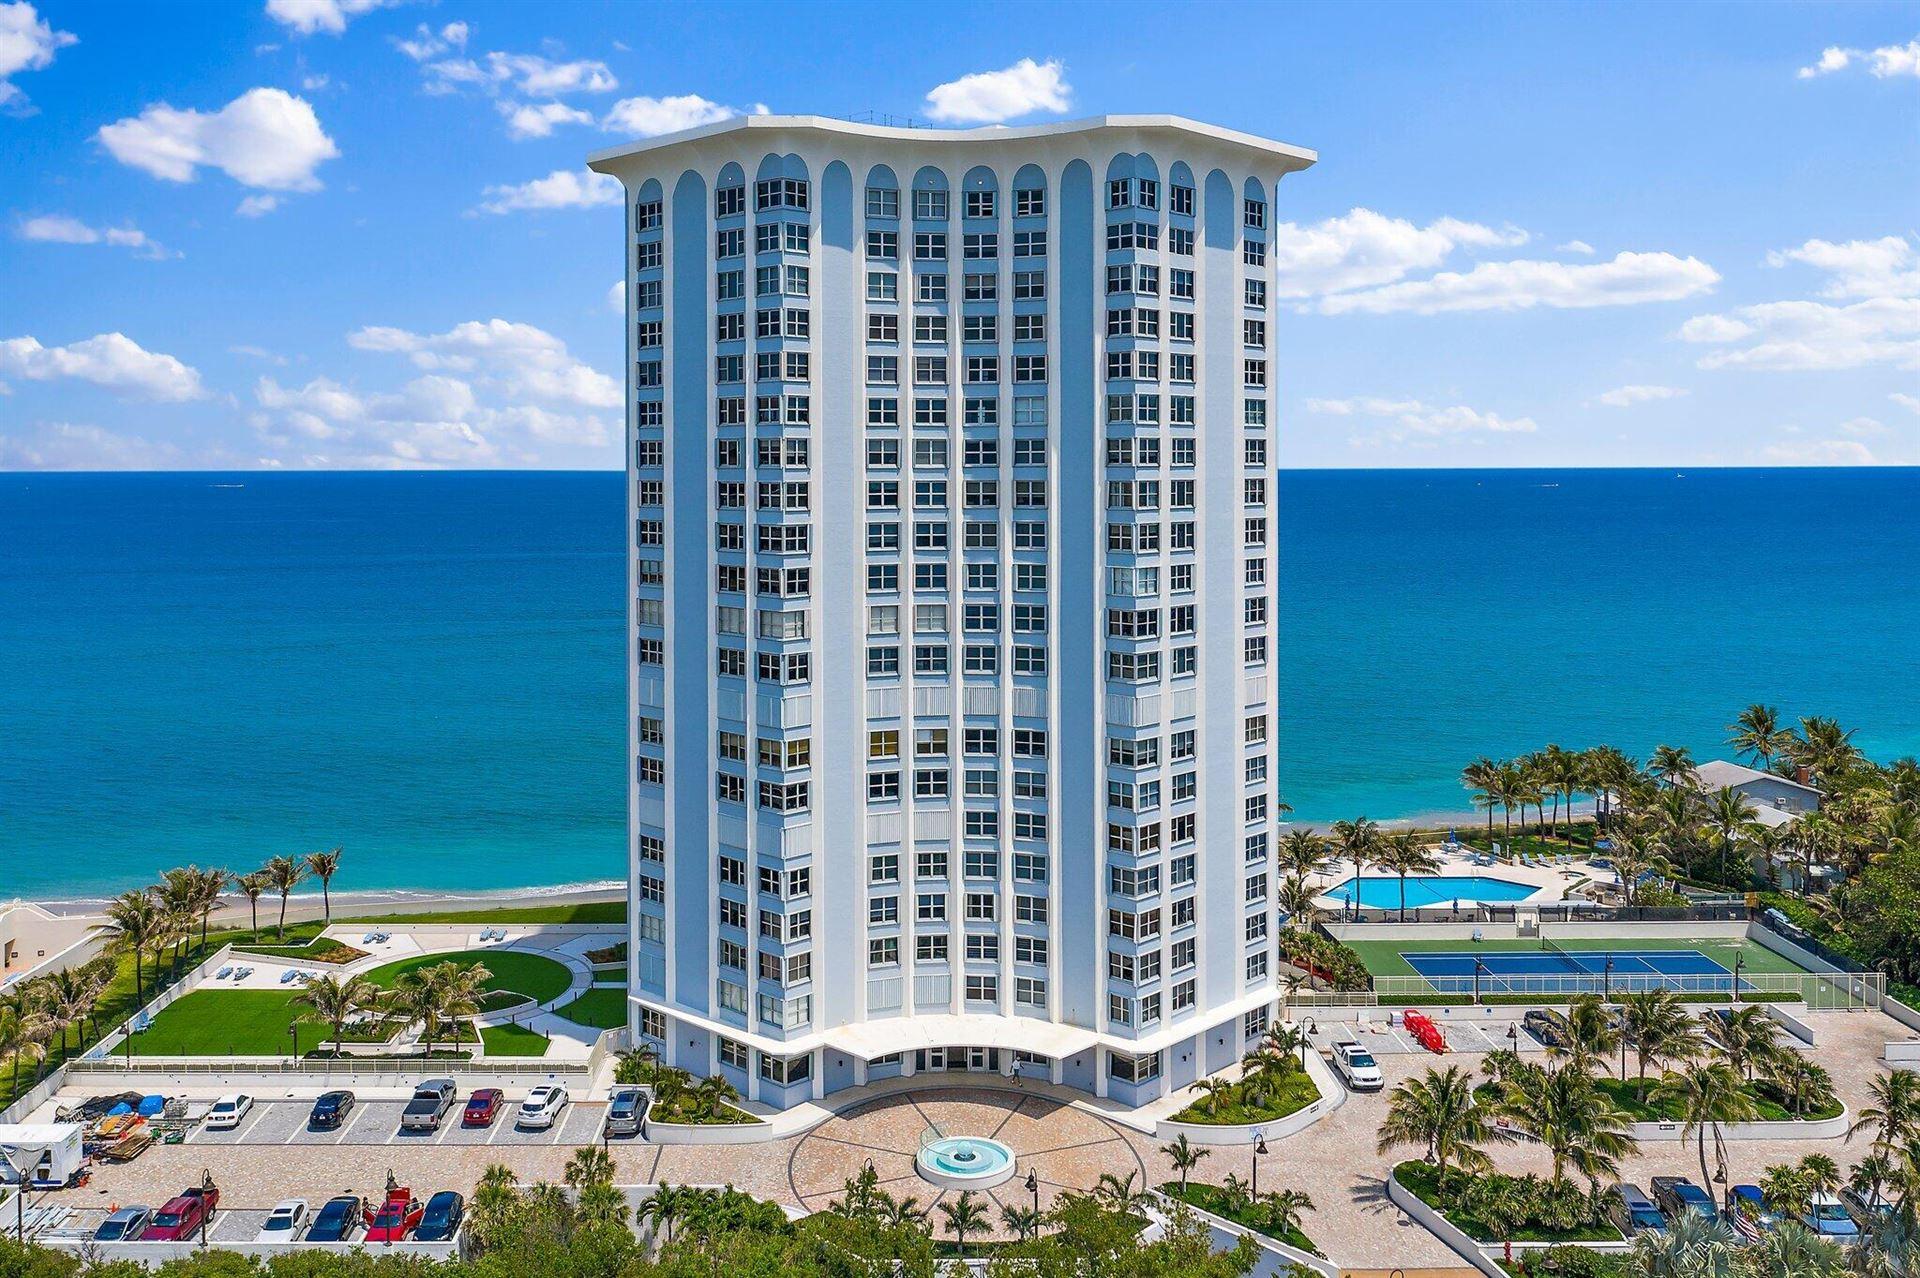 Photo of 5200 N Ocean Drive #1206, Riviera Beach, FL 33404 (MLS # RX-10715428)